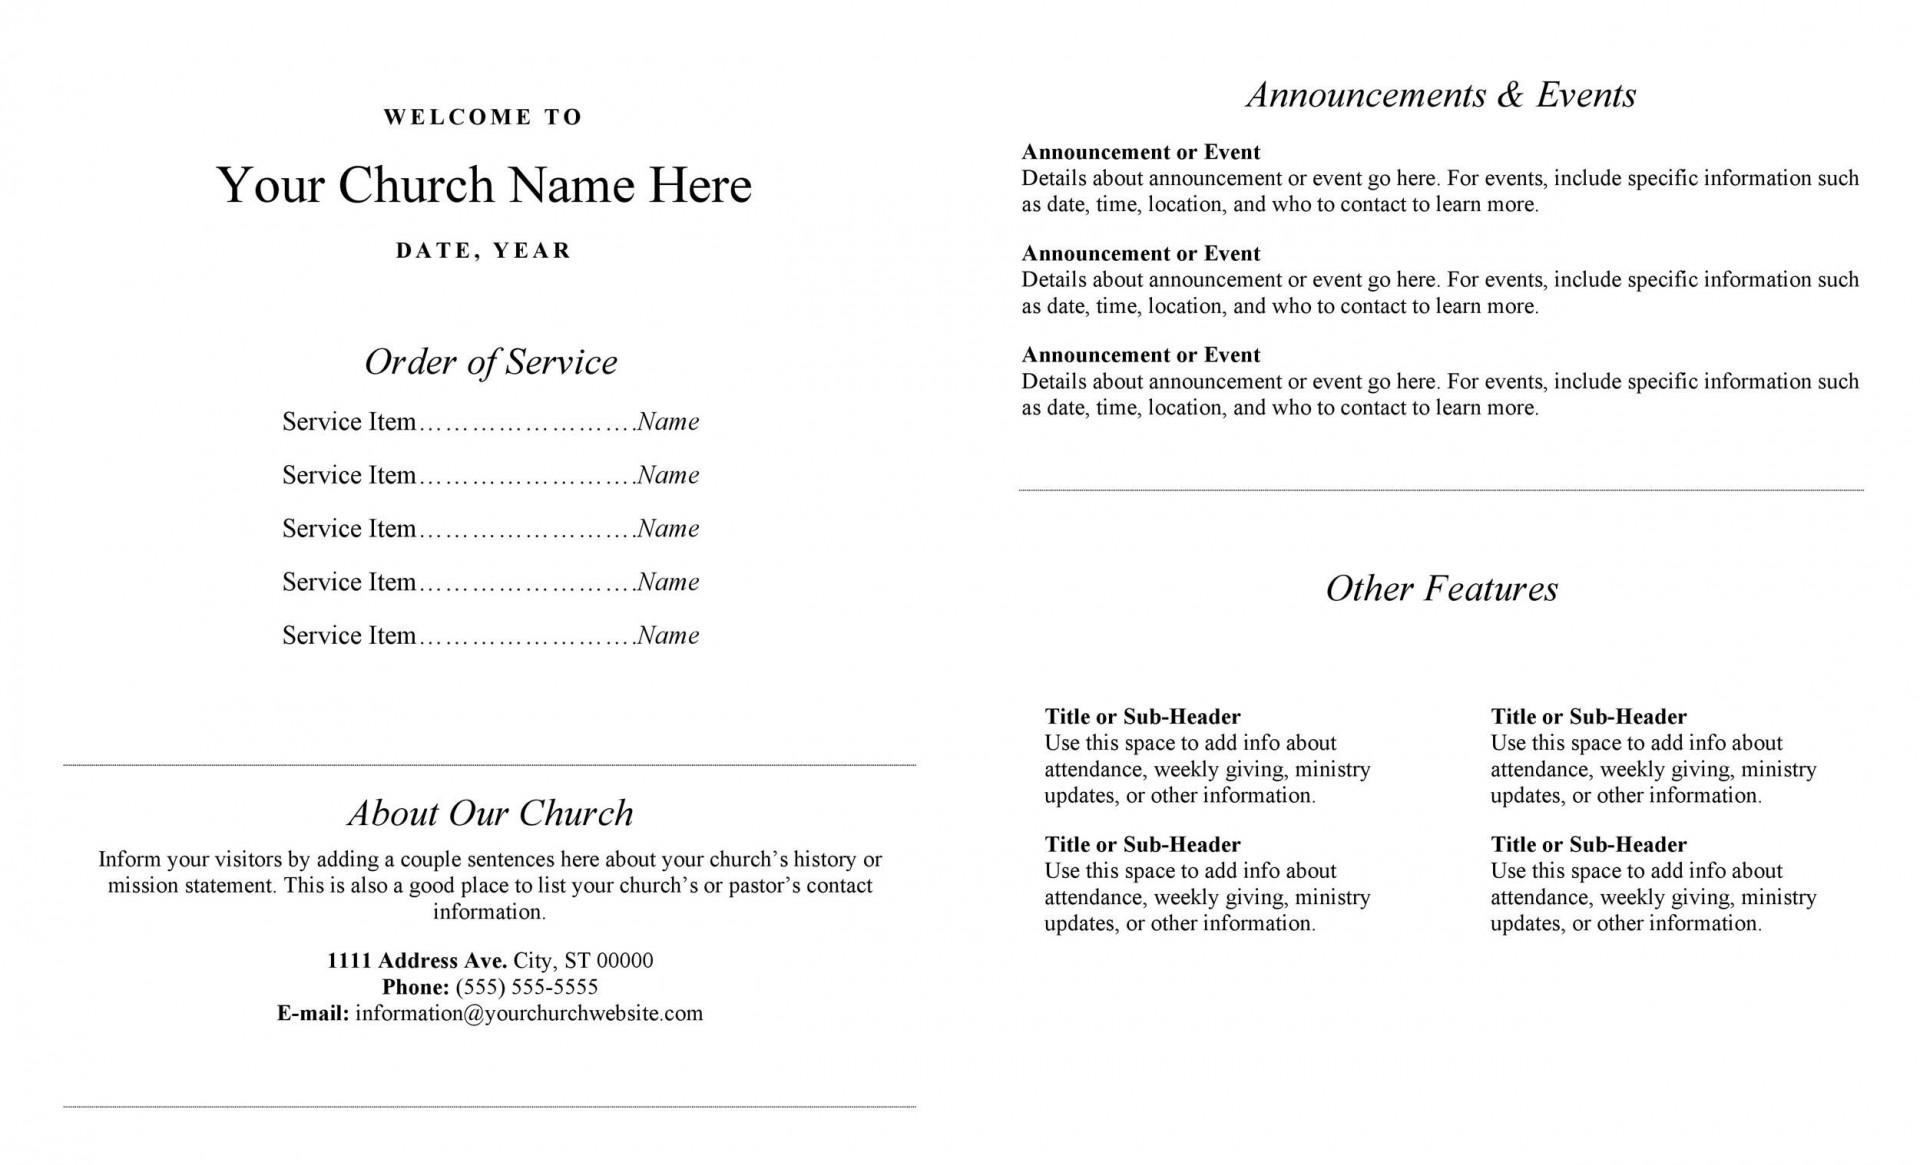 006 Breathtaking Church Bulletin Template Word Image  Program Free Wedding1920